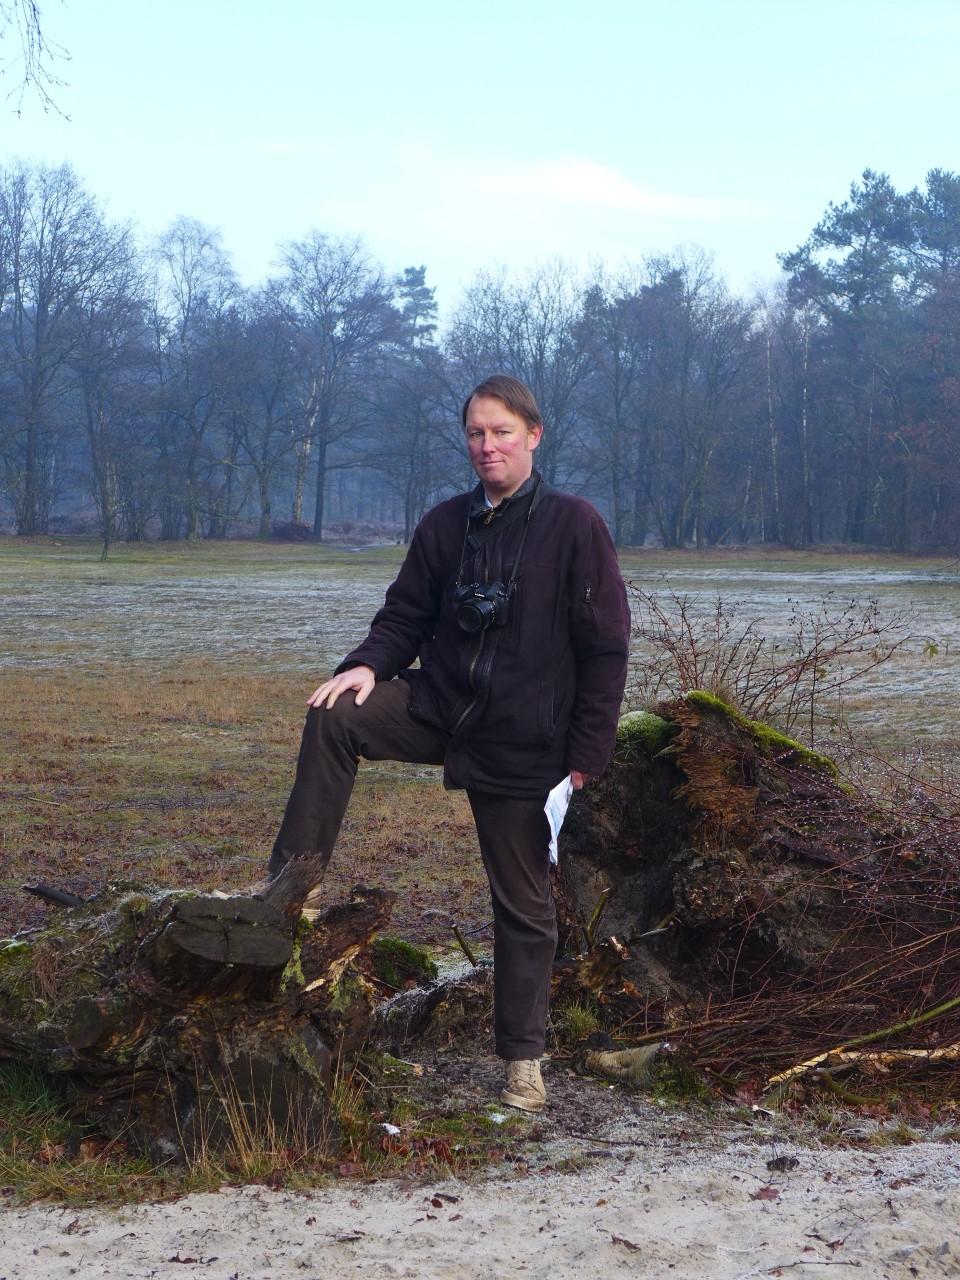 Drs S. (Sander) Koopman